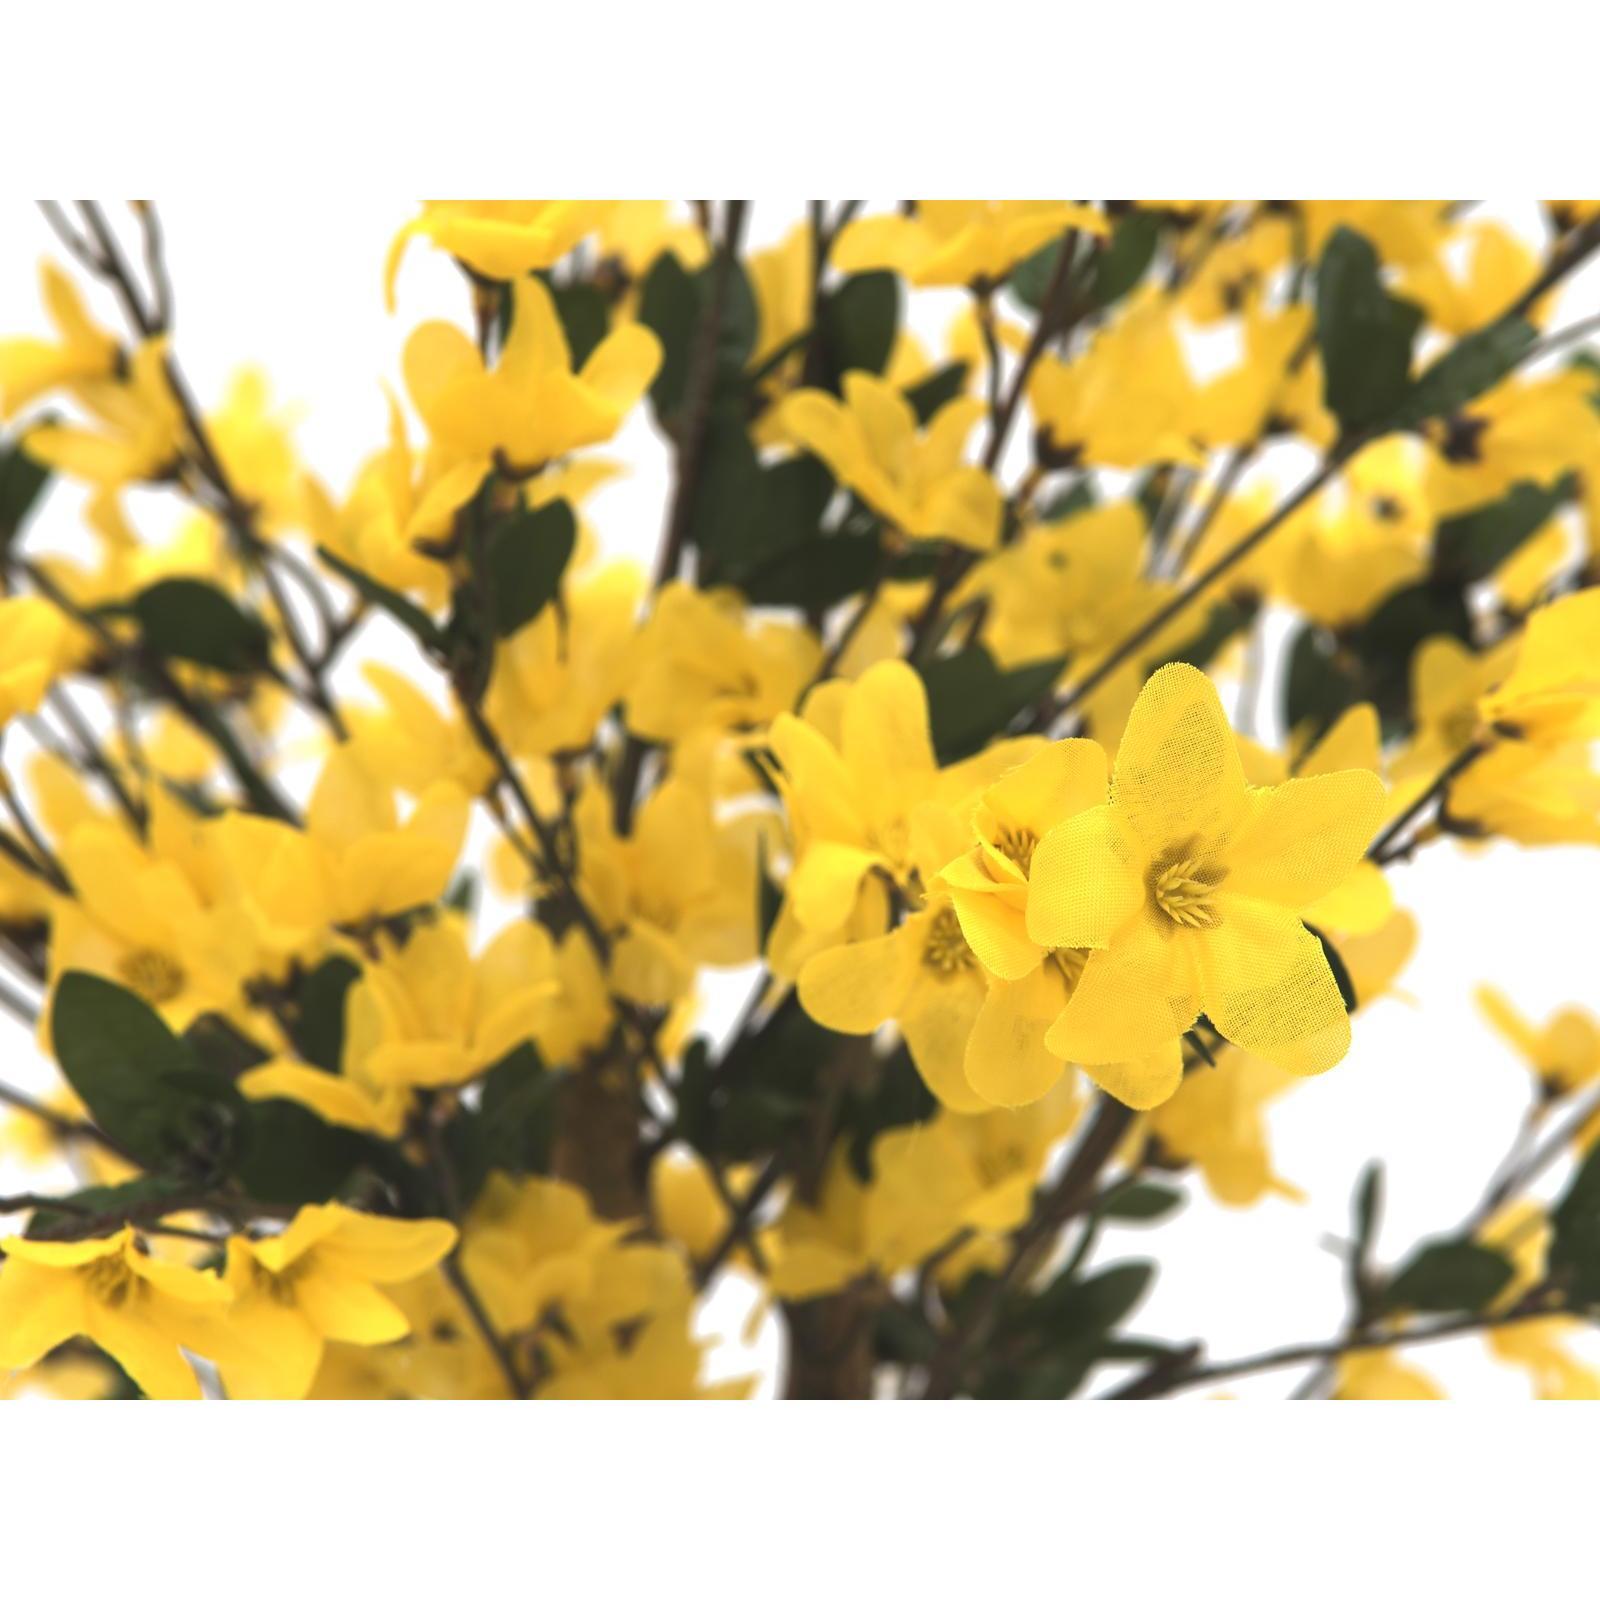 Europalms forsythia tree with 4 trunks yellow 120 cm su for Bougainvillea bonsai prezzo